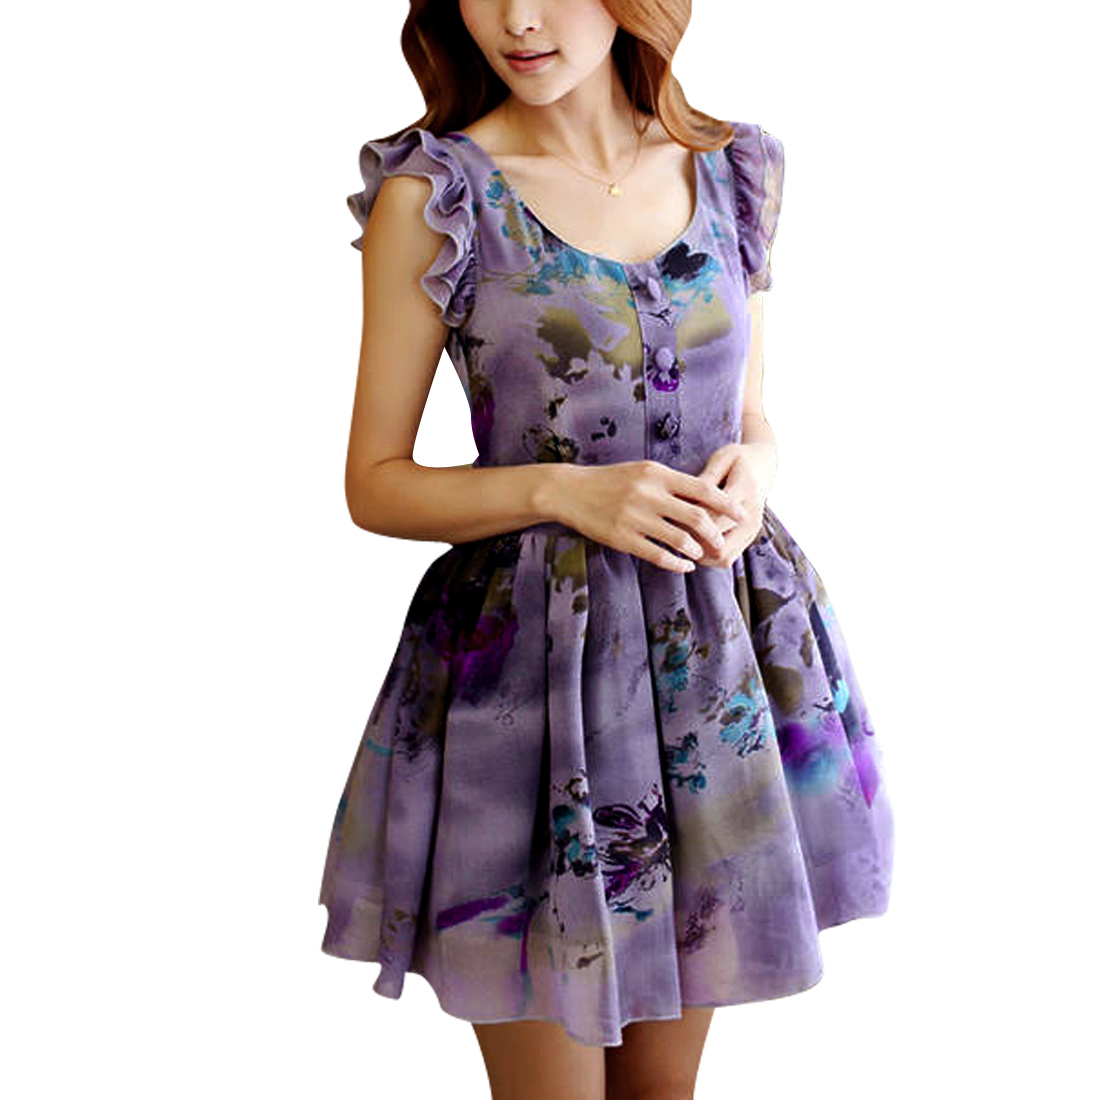 Women Flutter Trim Novelty Prints Chiffon Pleated Dress Purple S